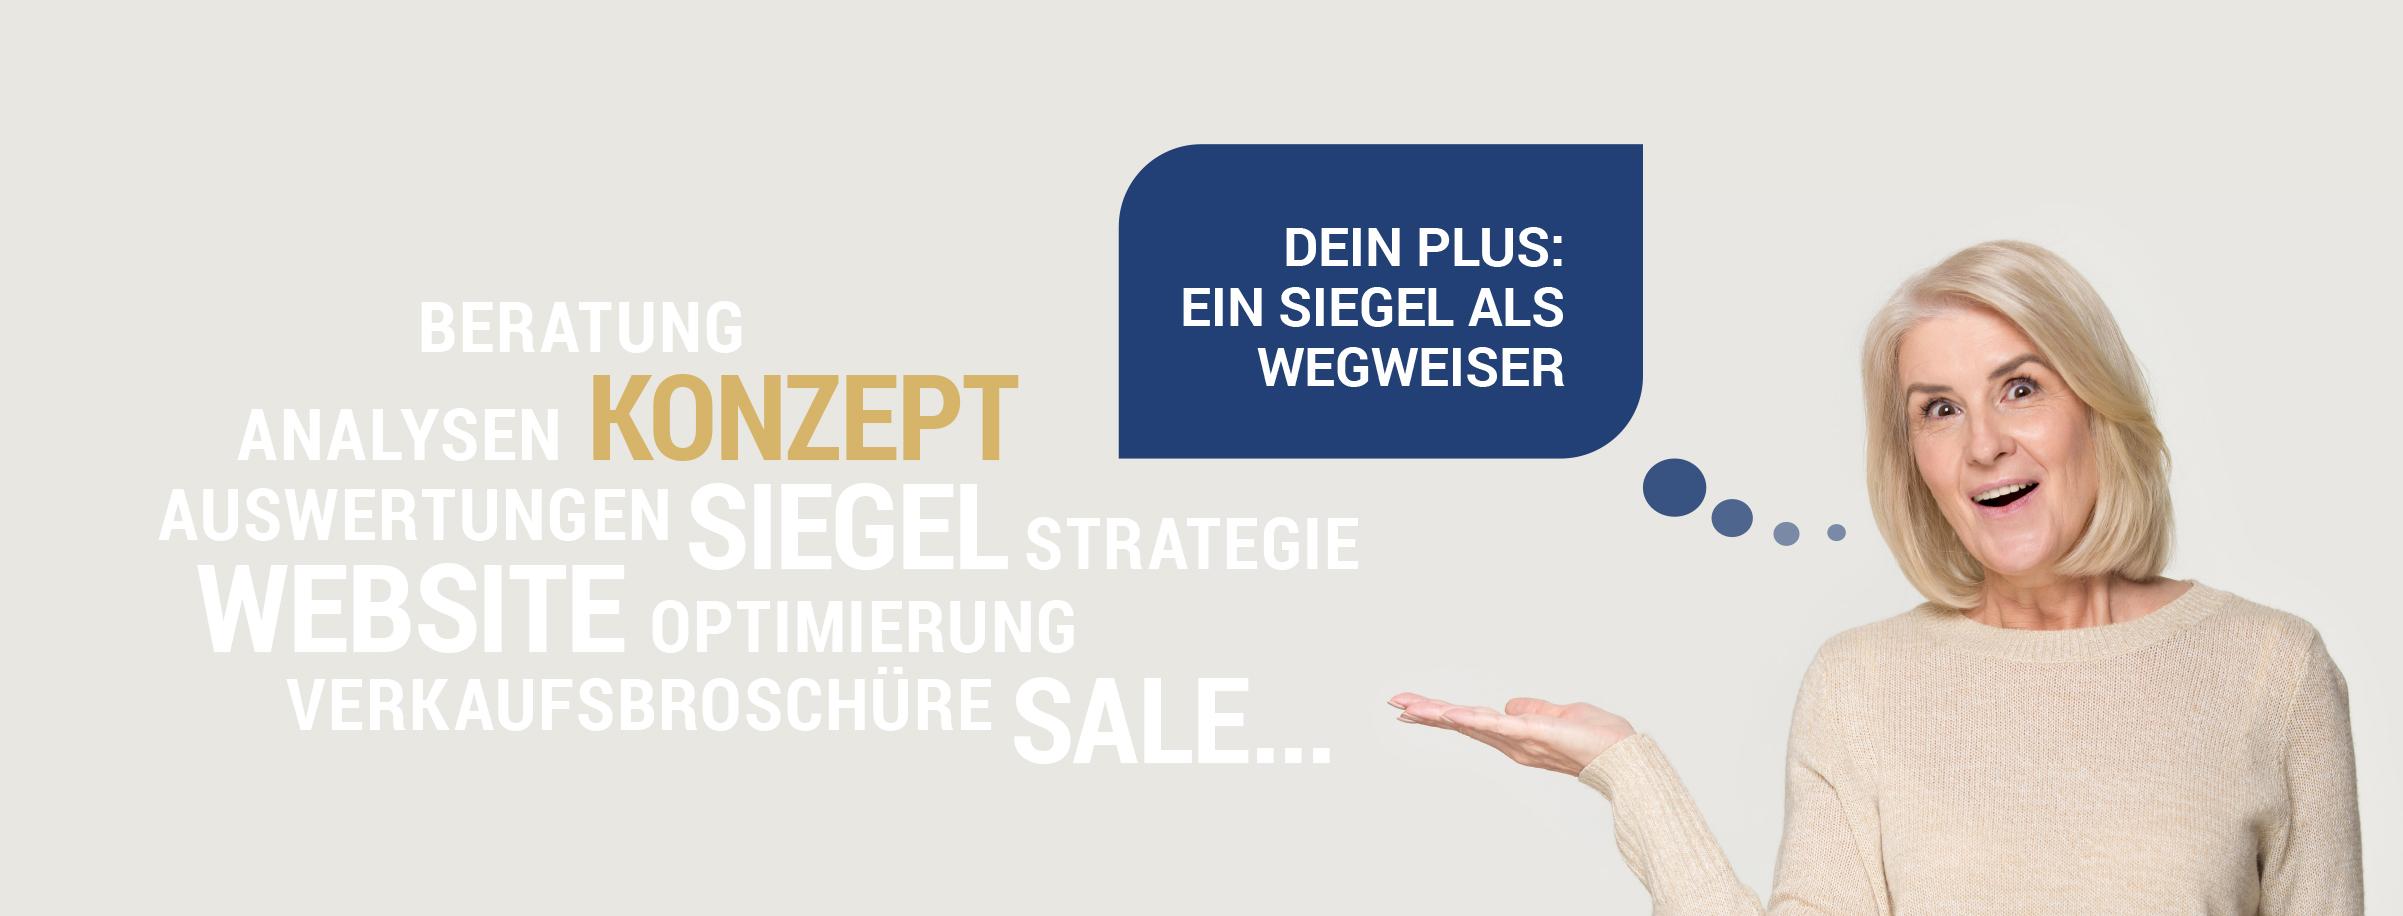 agentur beratung vertrieb sales cold calls mannheim heidelberg website